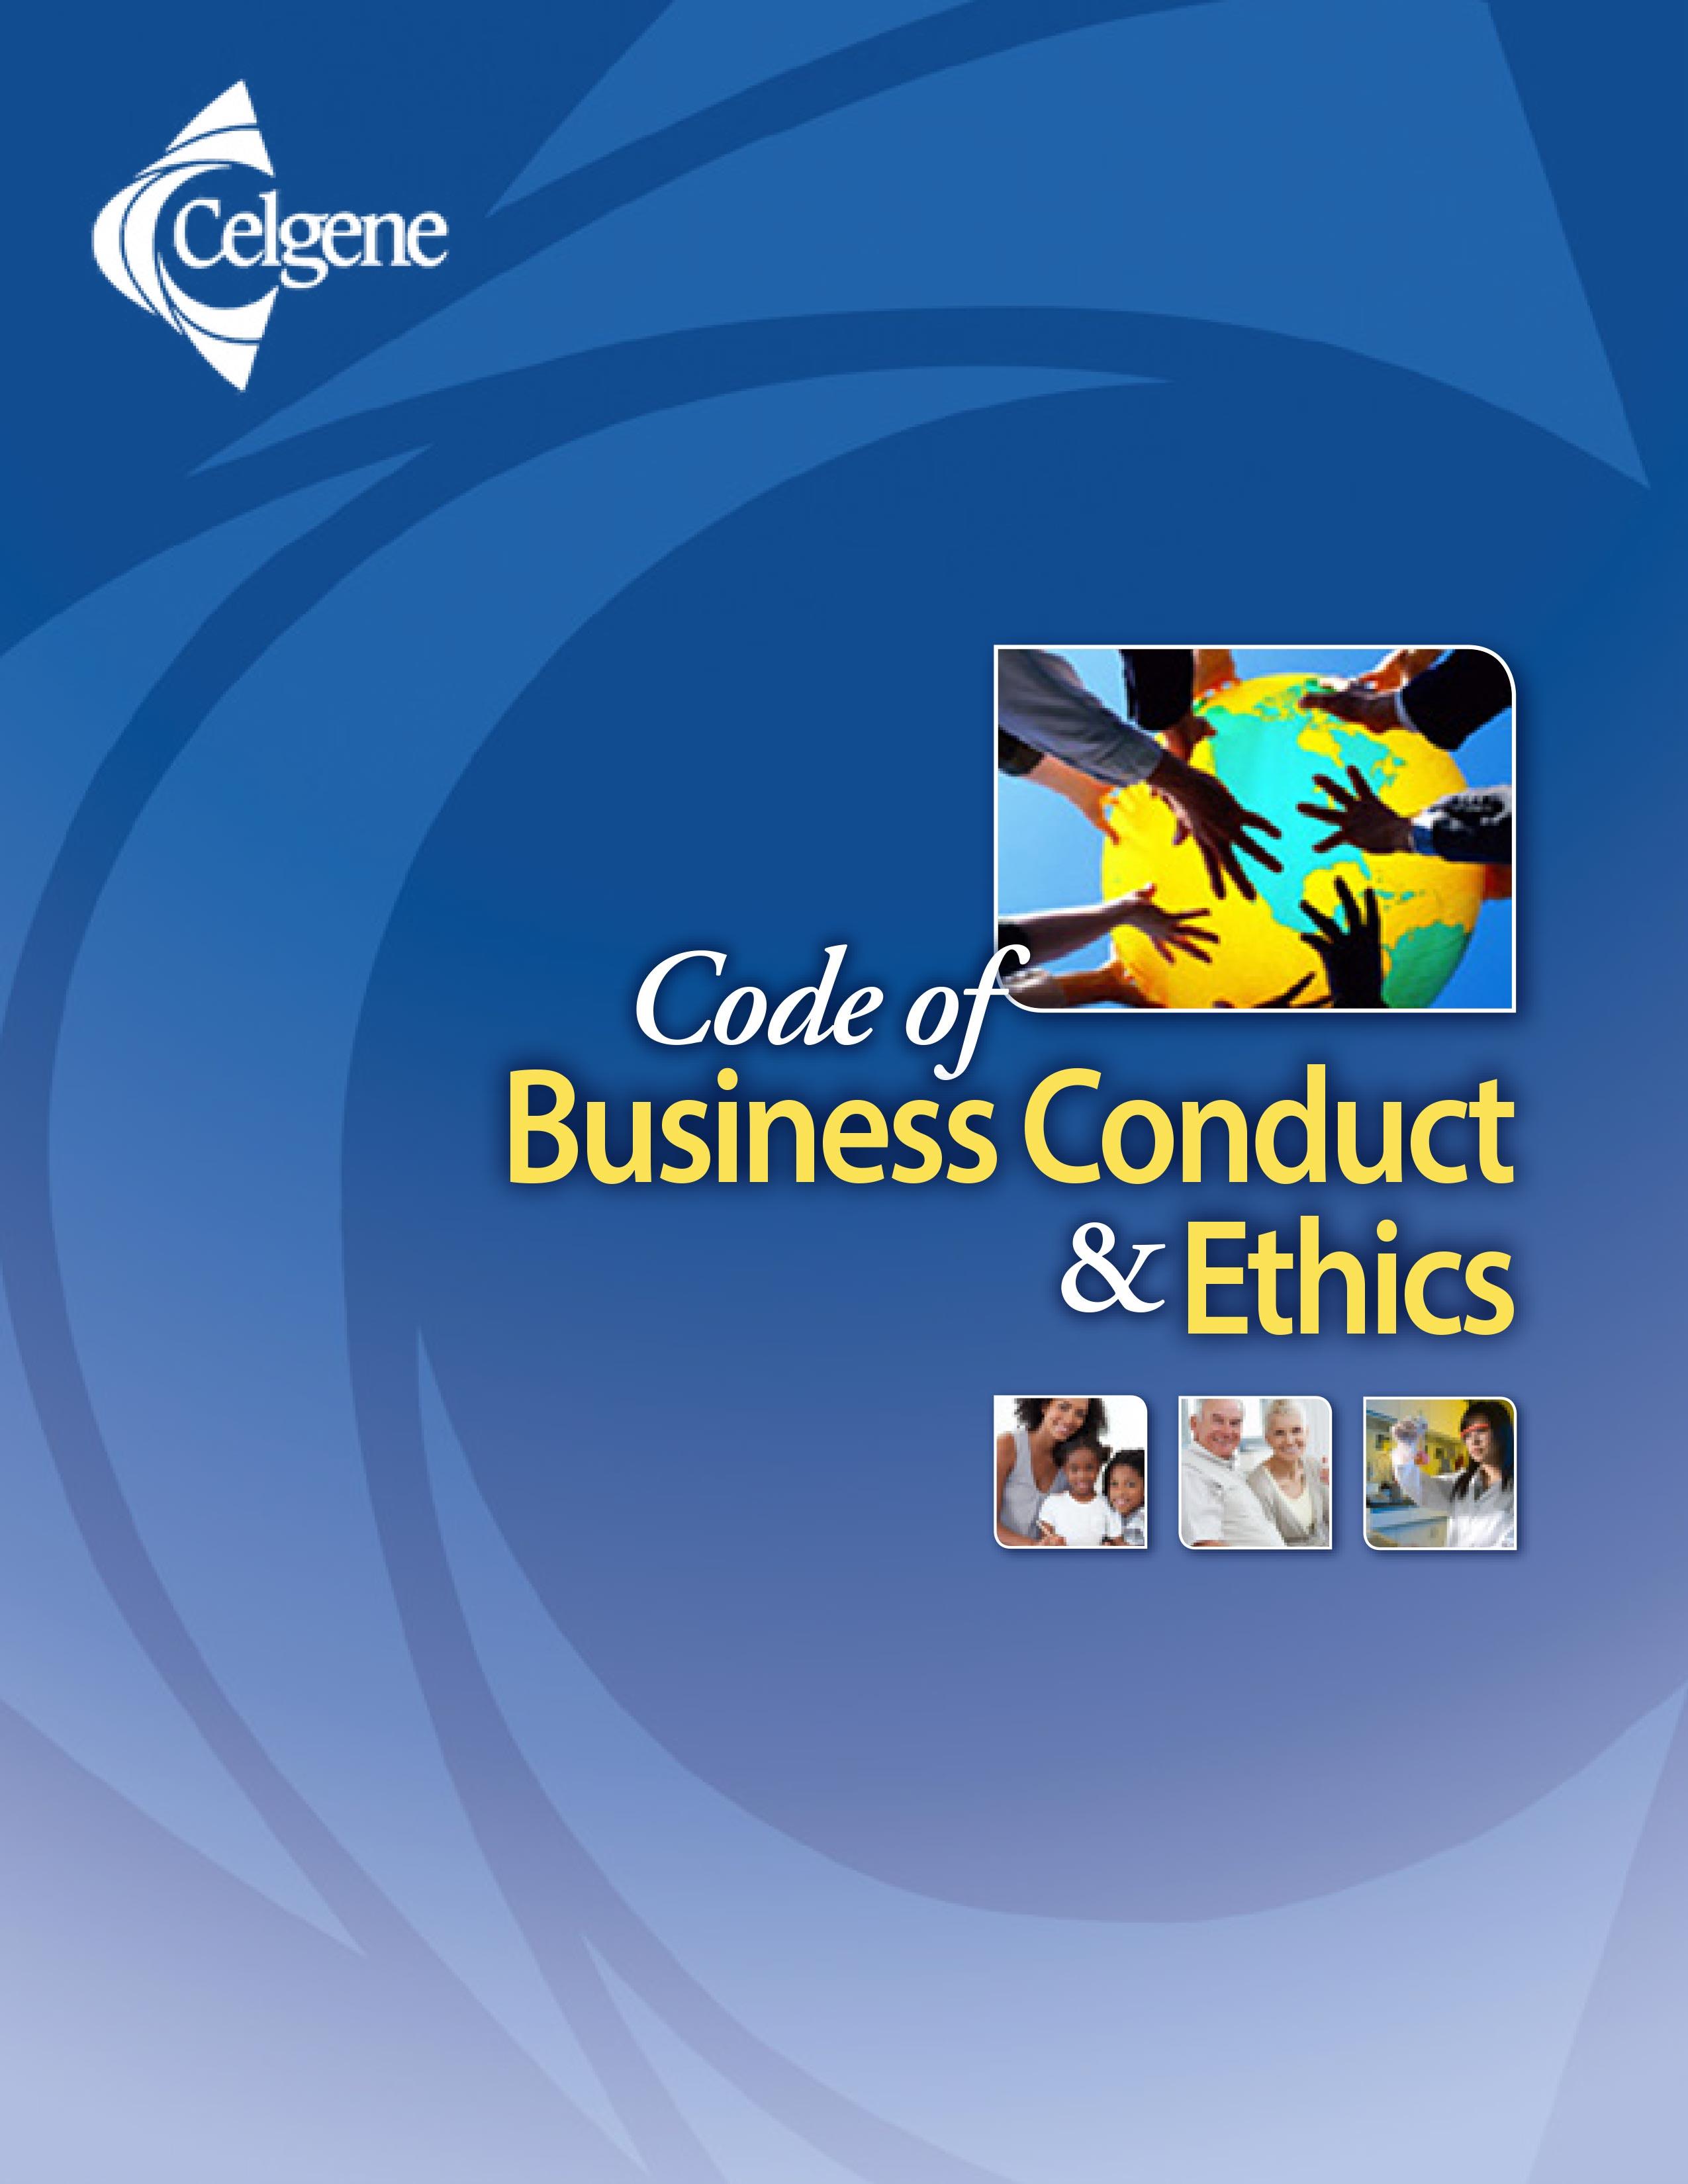 código-de-conduta-empresarial-cv